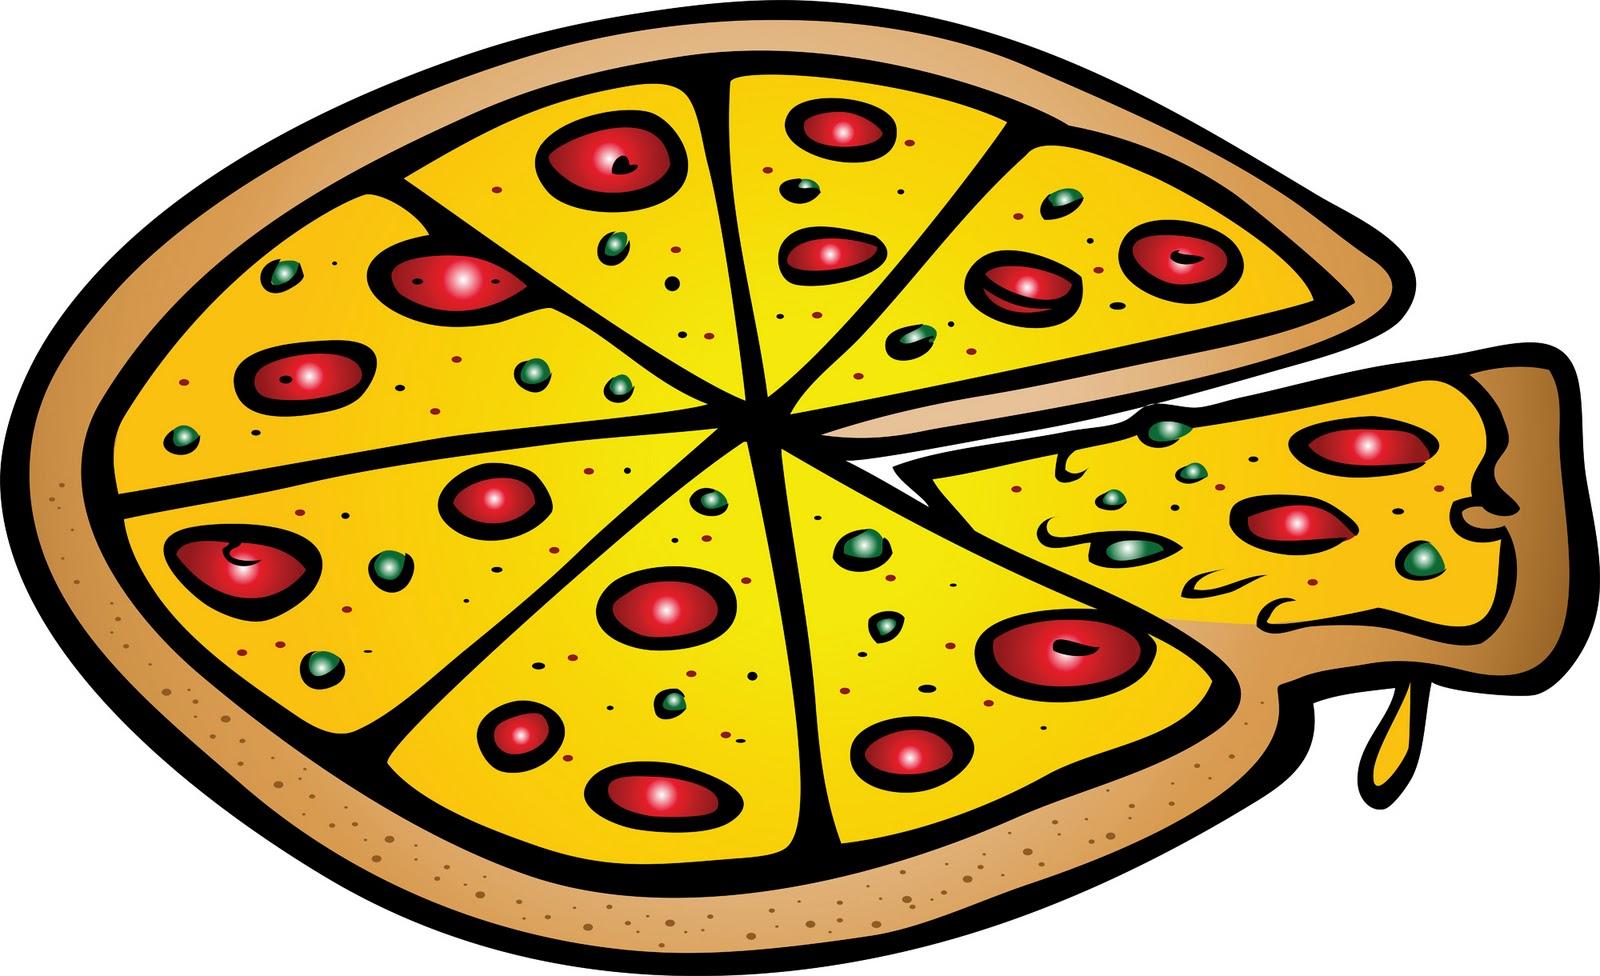 1600x976 Pizza Clip Art Pizza Clipart Photo Niceclipart